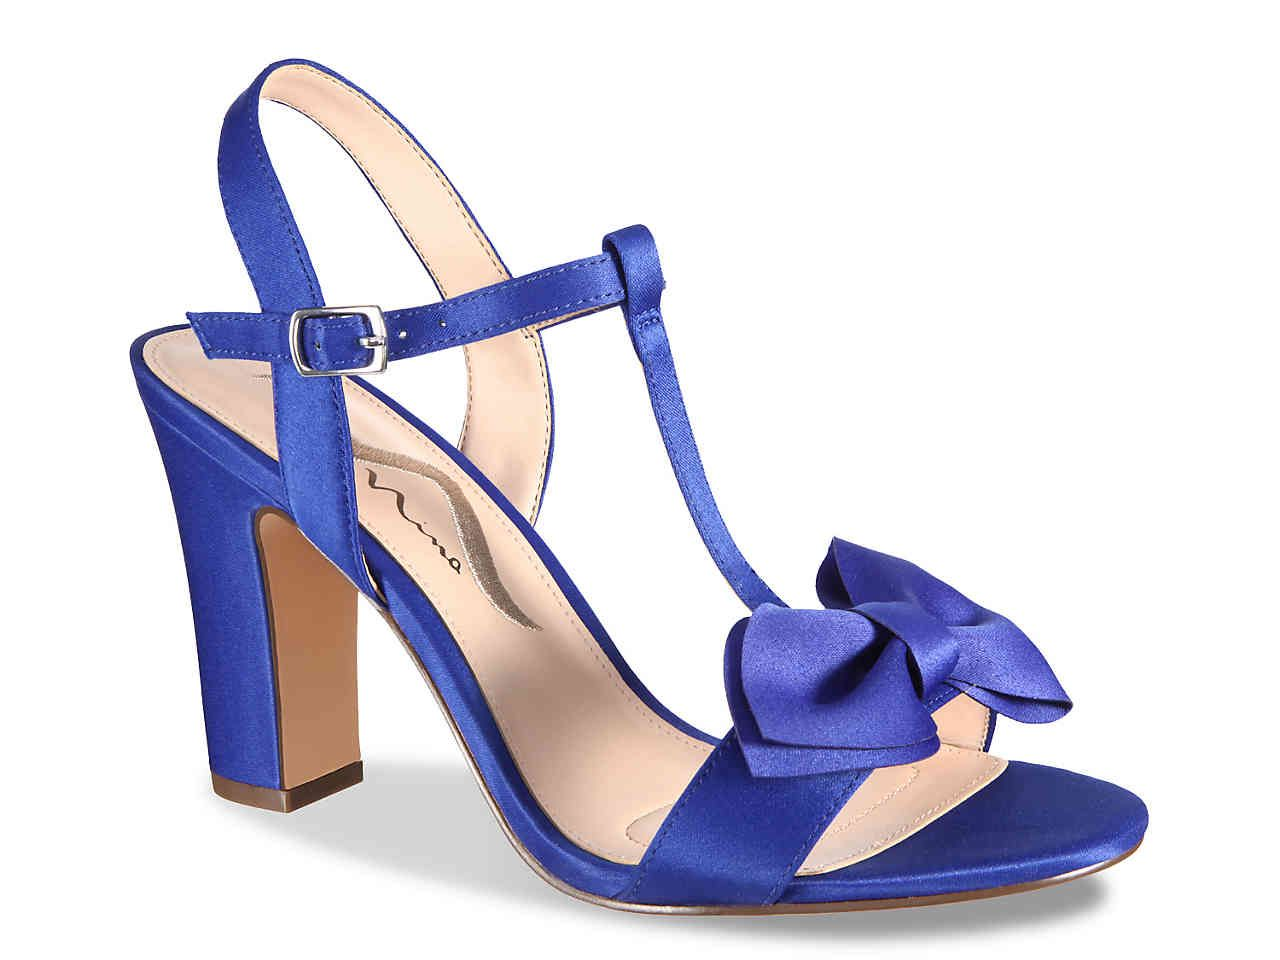 navy dress shoes wide width